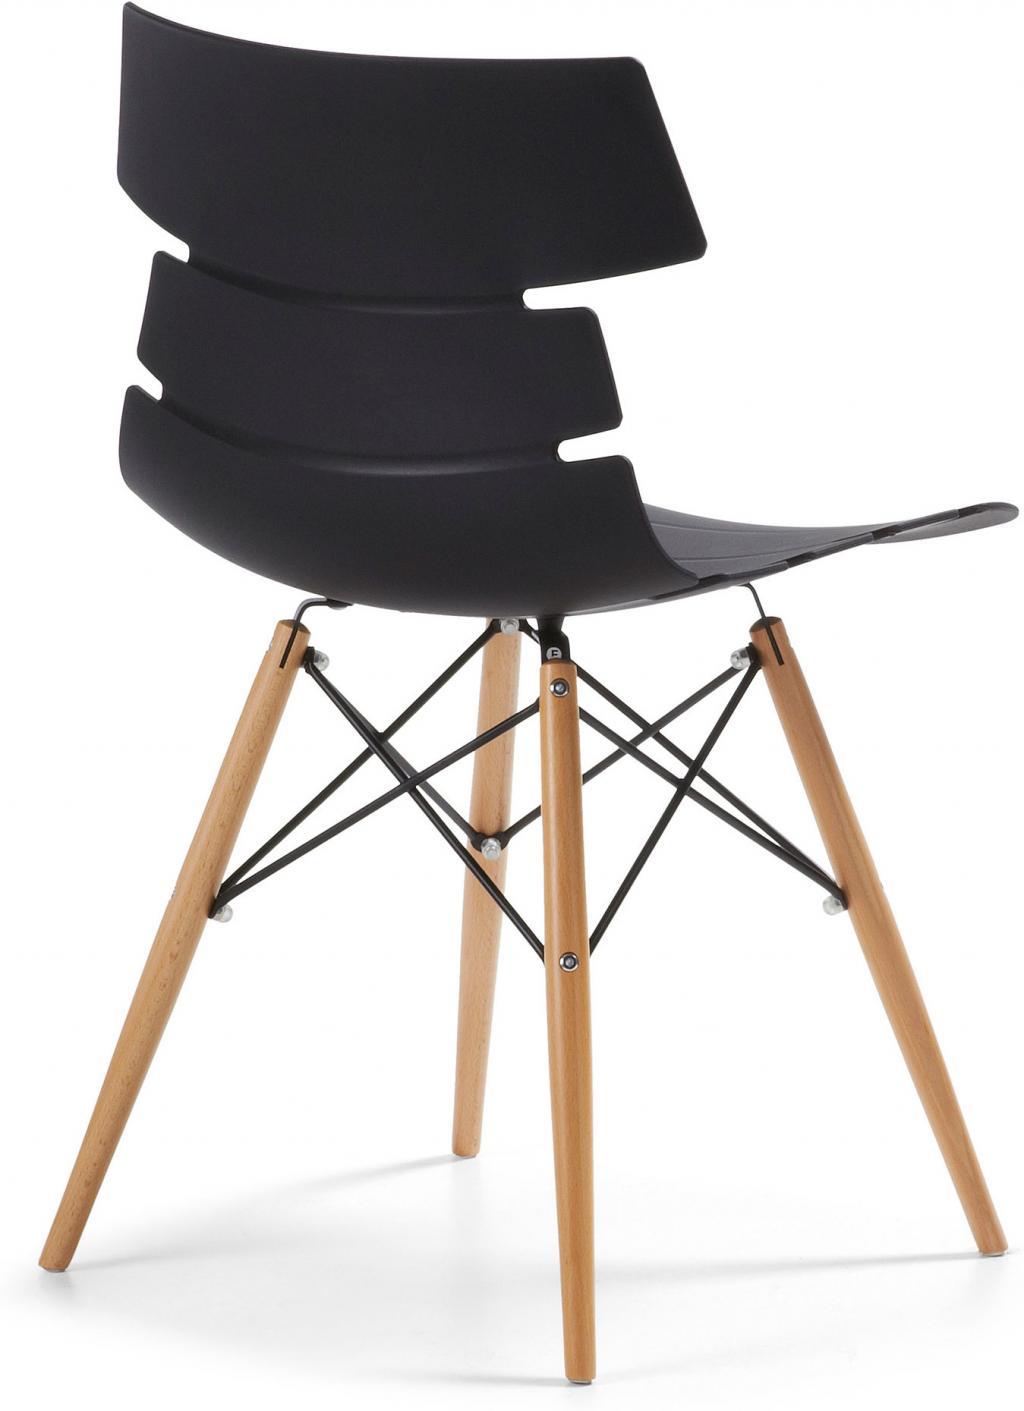 stuhl kalm schwarz holz kunststoff la forma kaufen wohn und. Black Bedroom Furniture Sets. Home Design Ideas